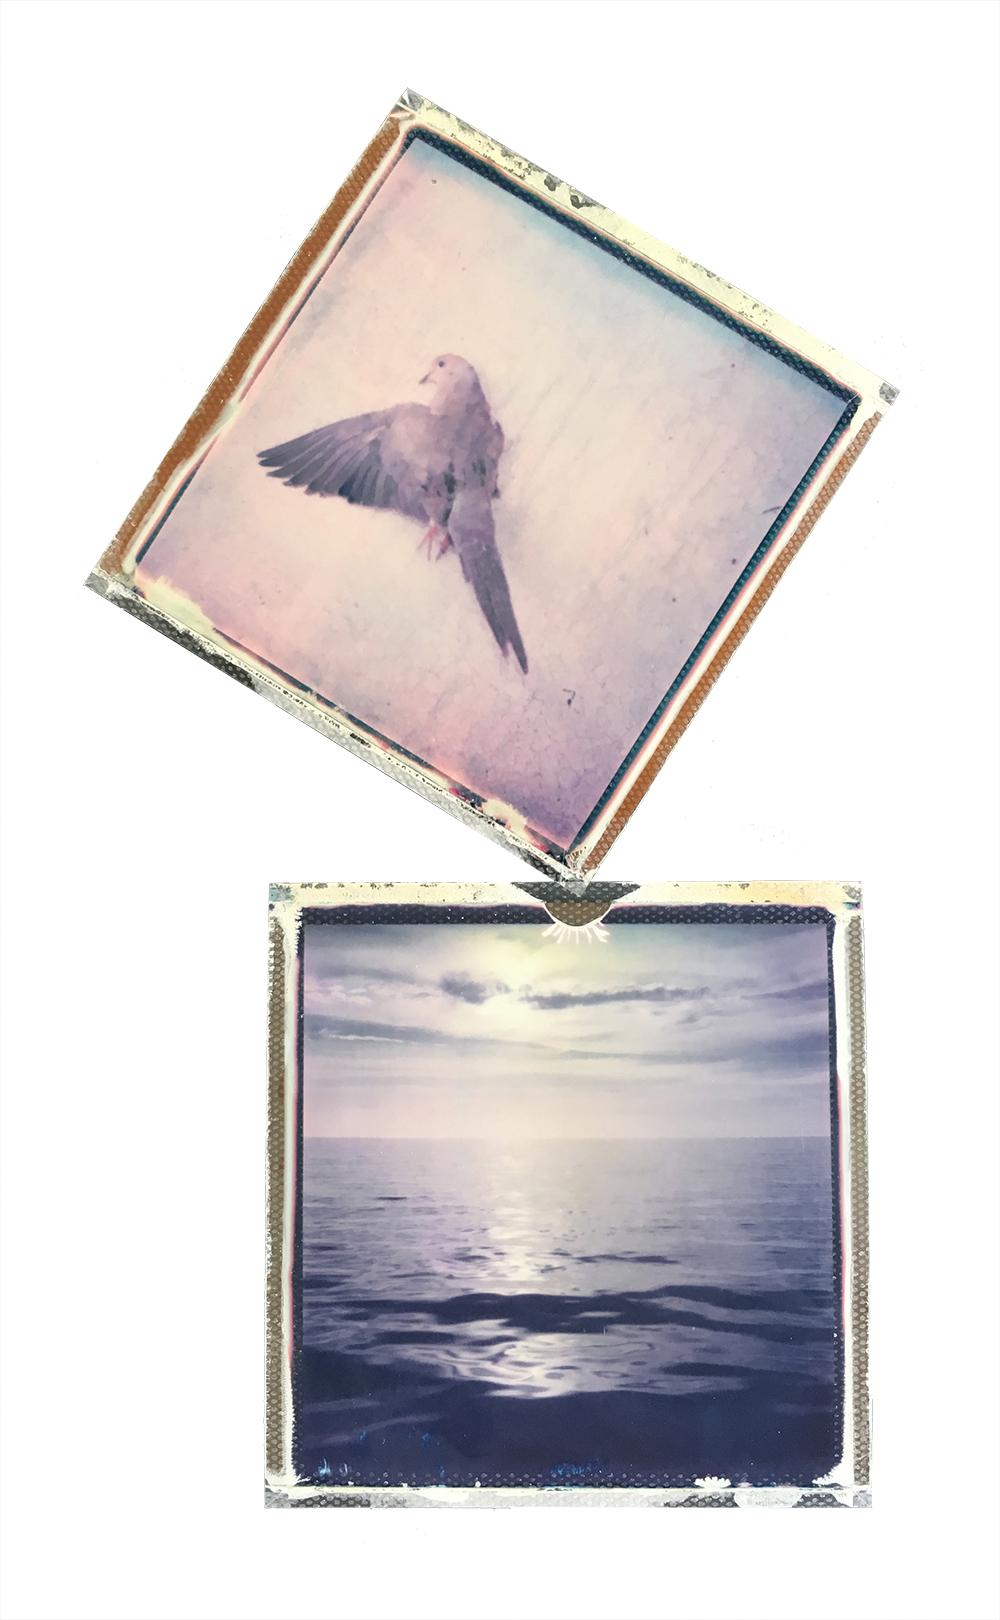 emma j starr analogue photography polaroid collage key west 1.jpg